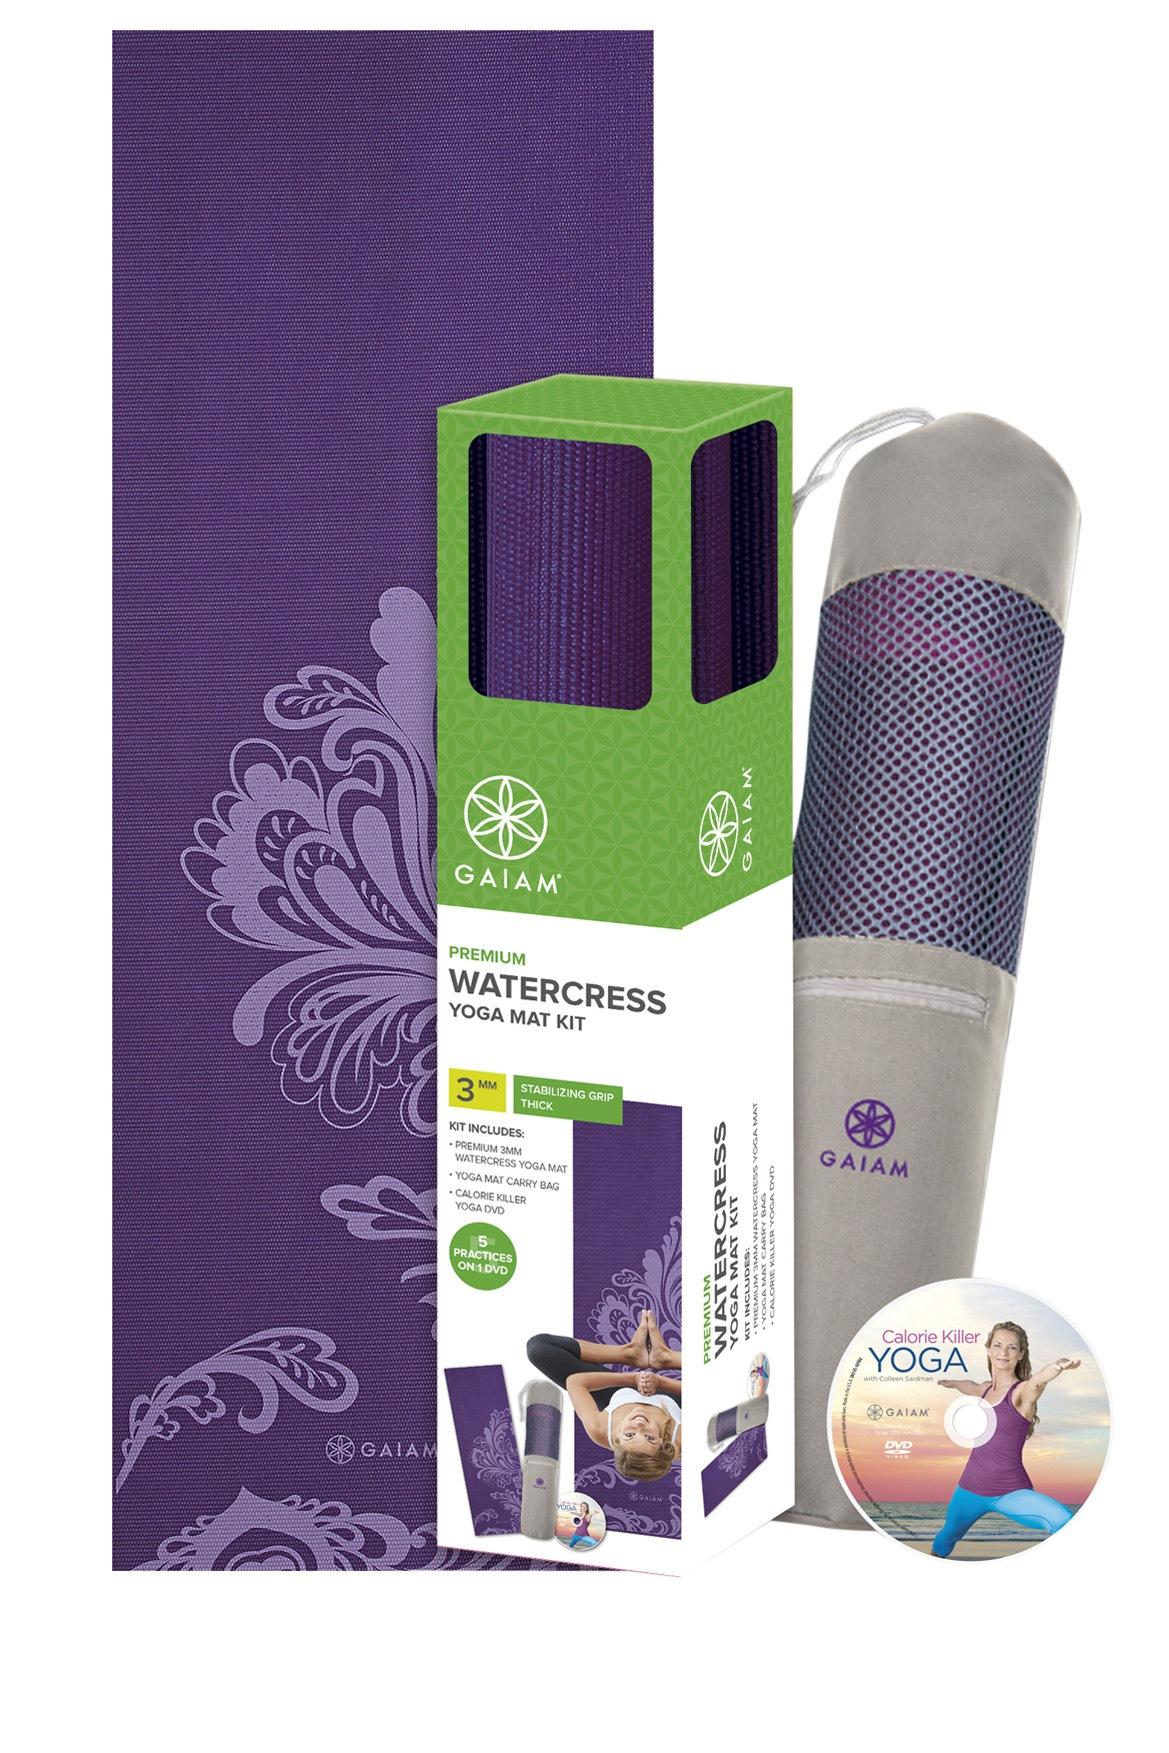 Gaiam Watercress Yoga Mat Kit Myer Online